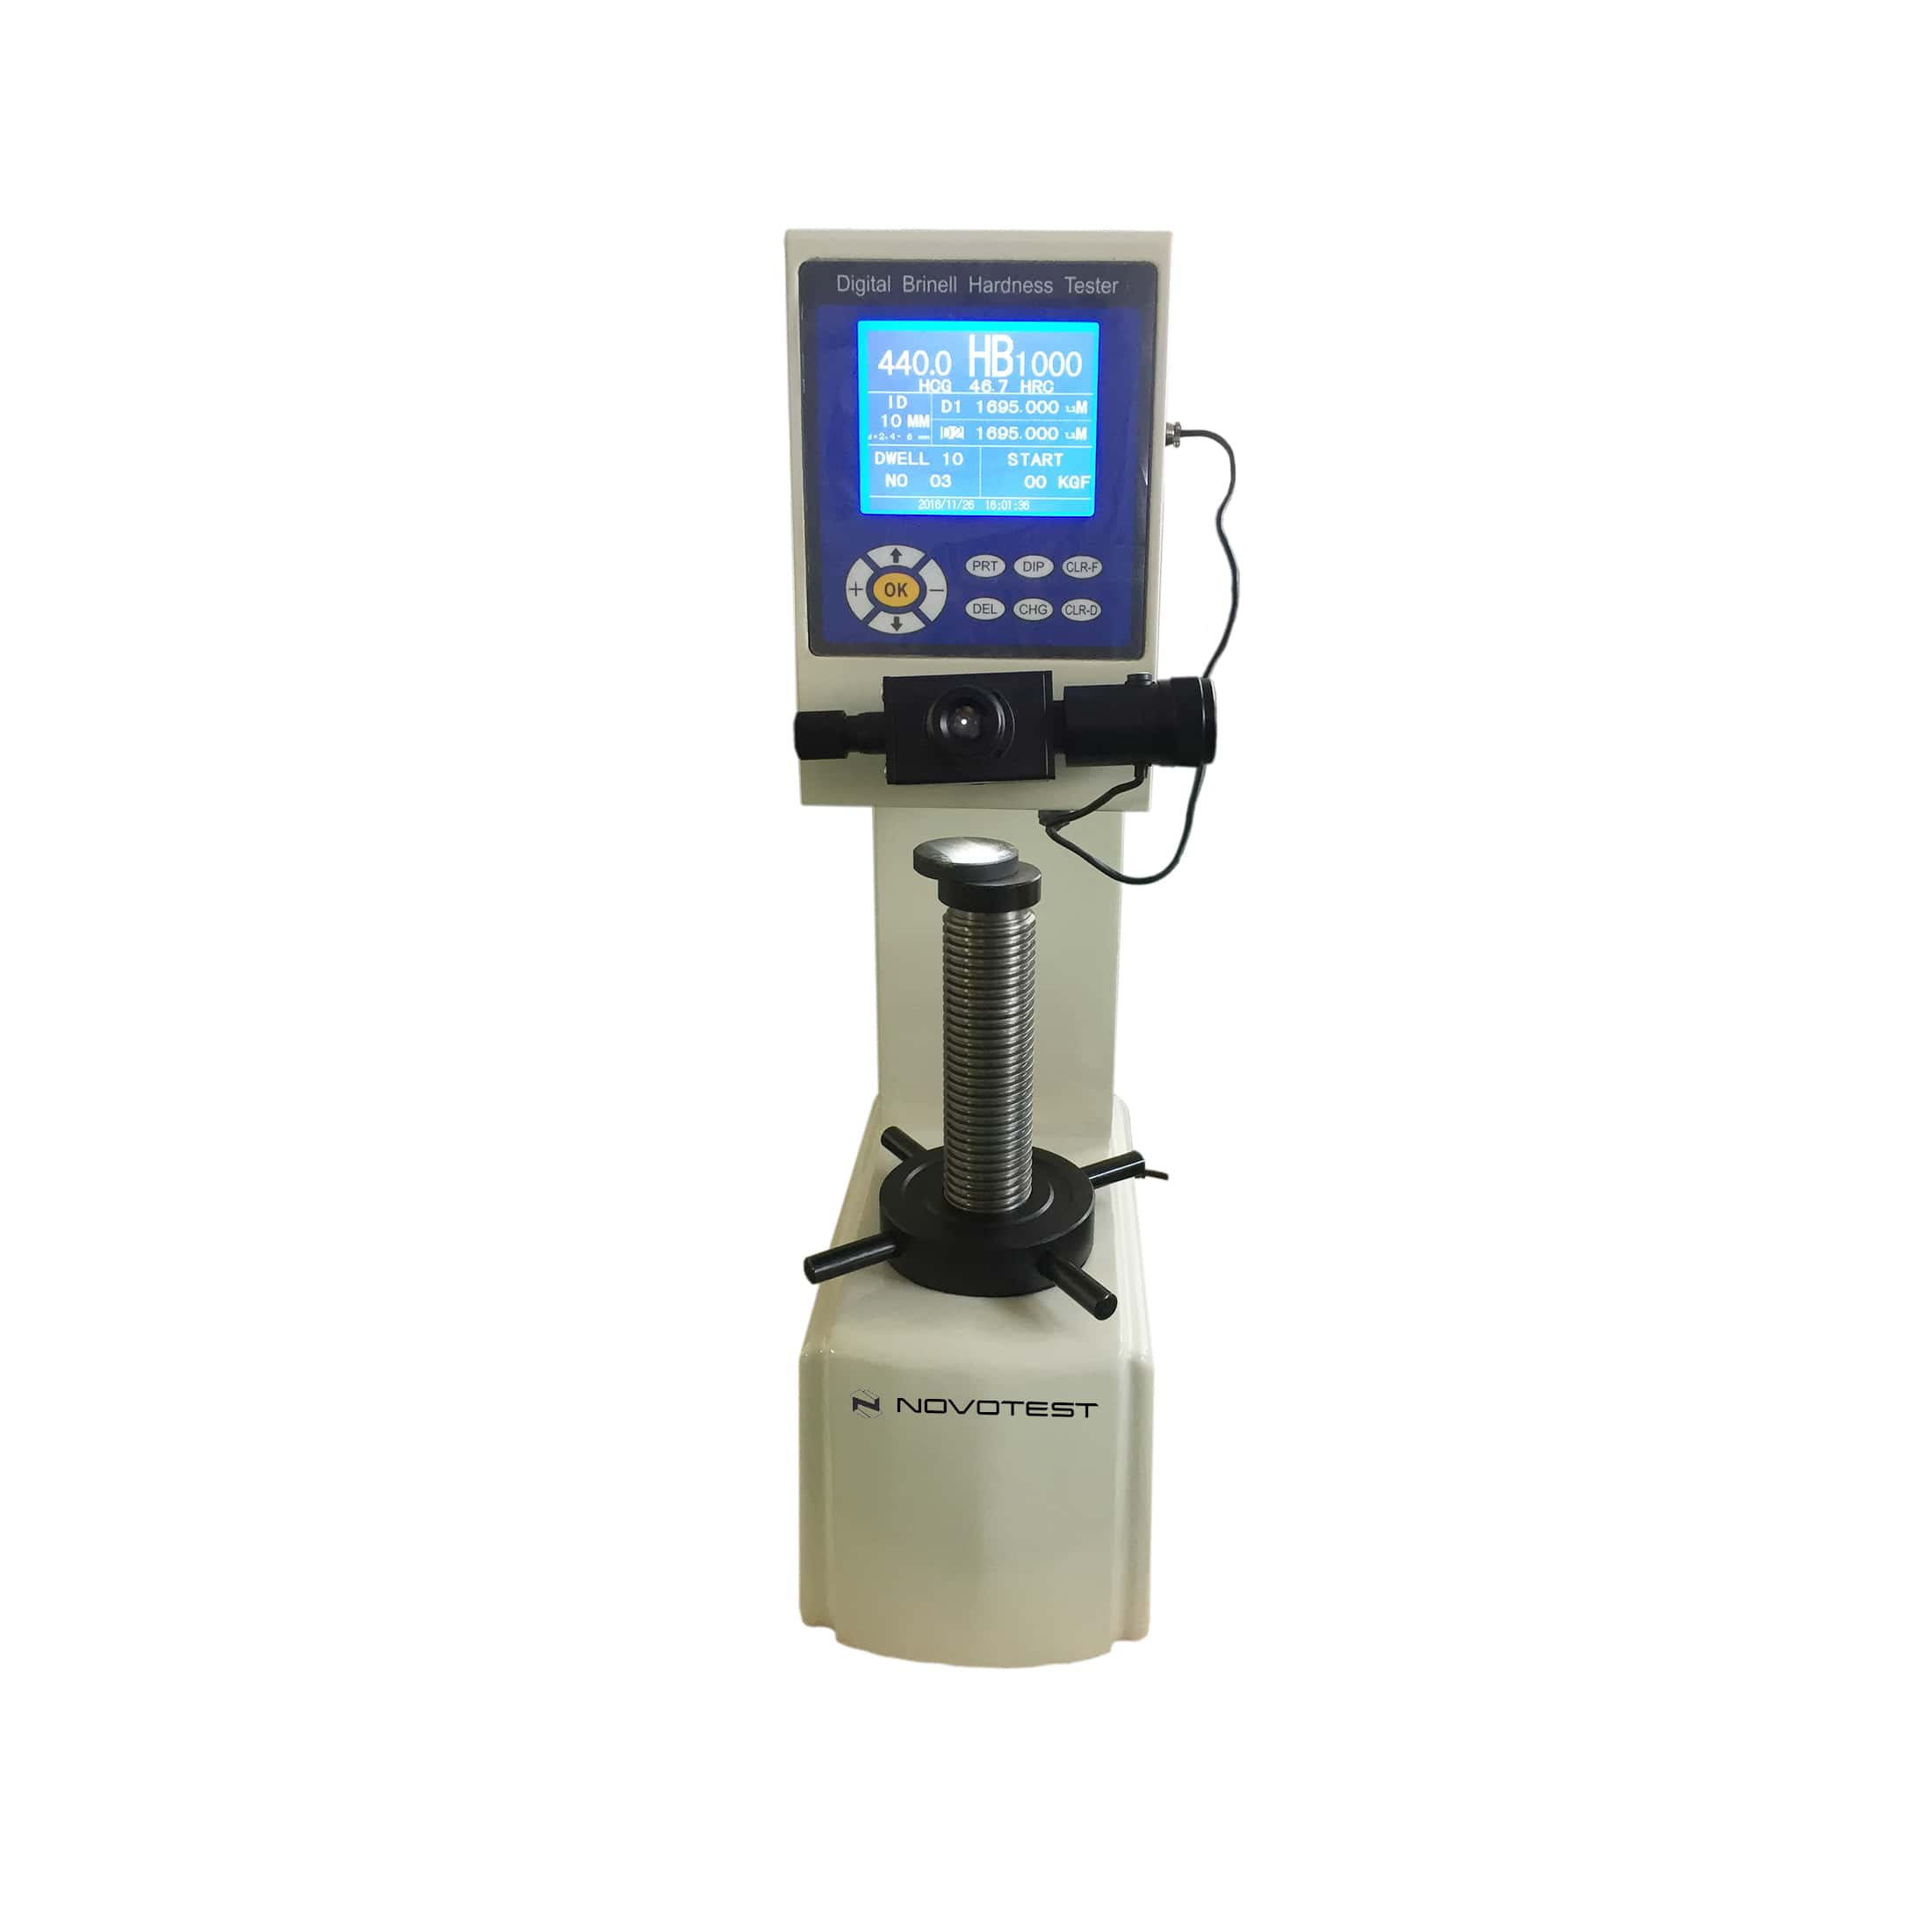 Digital Brinell Hardness Tester NOVOTEST TB-B-C-1